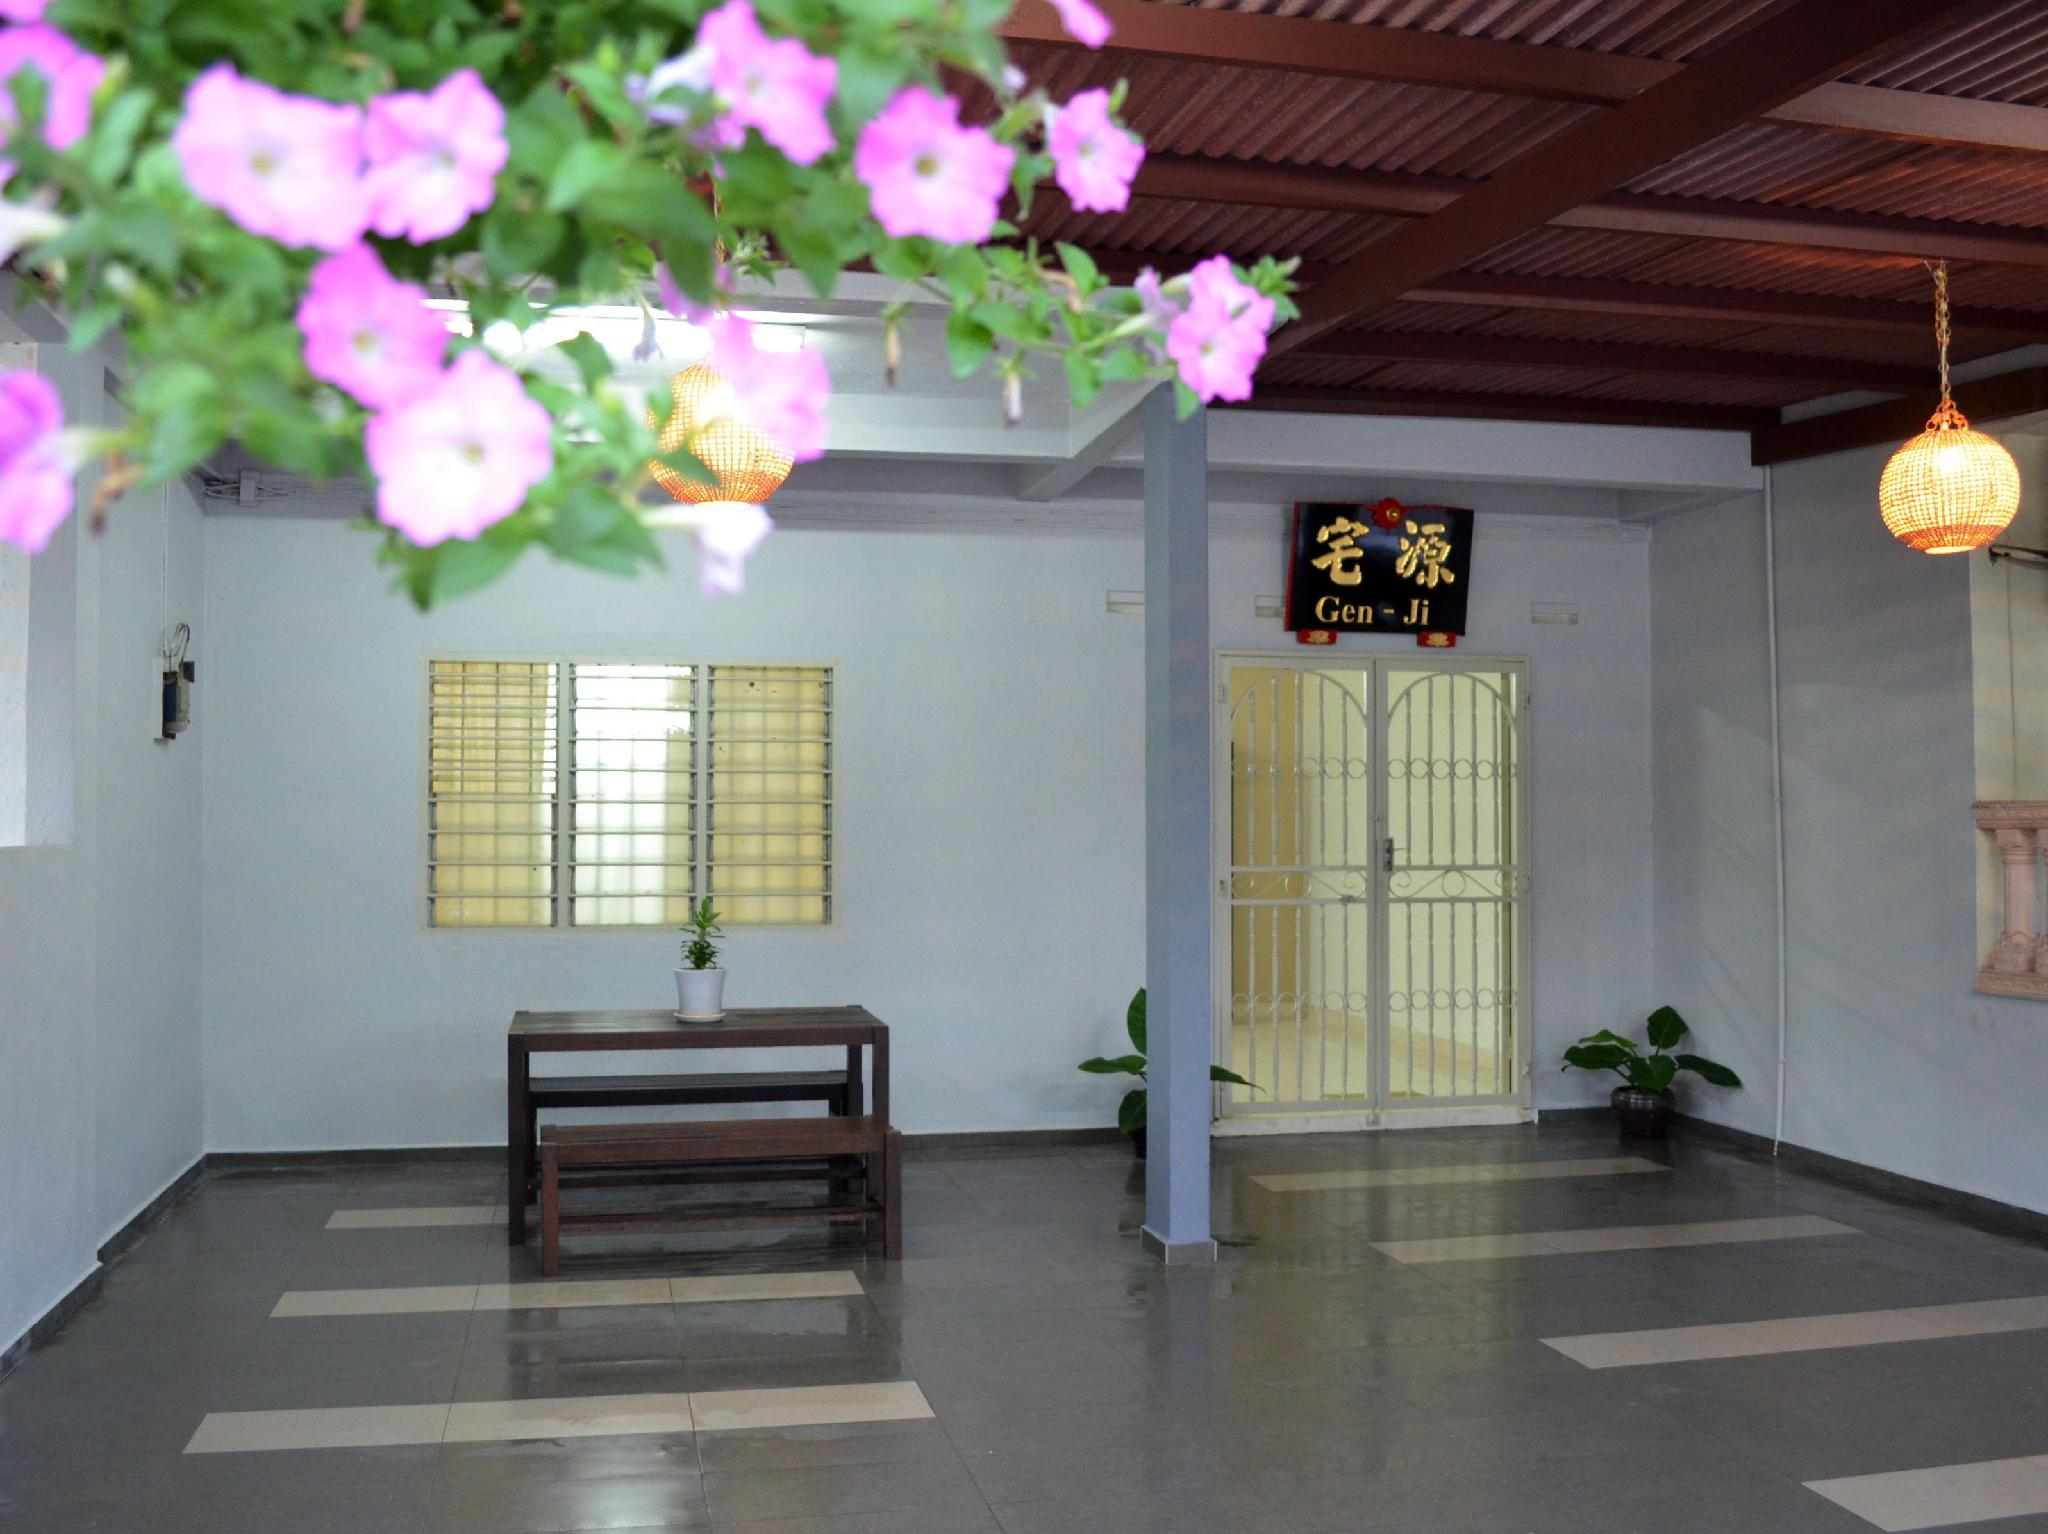 Gen Ji Cottage